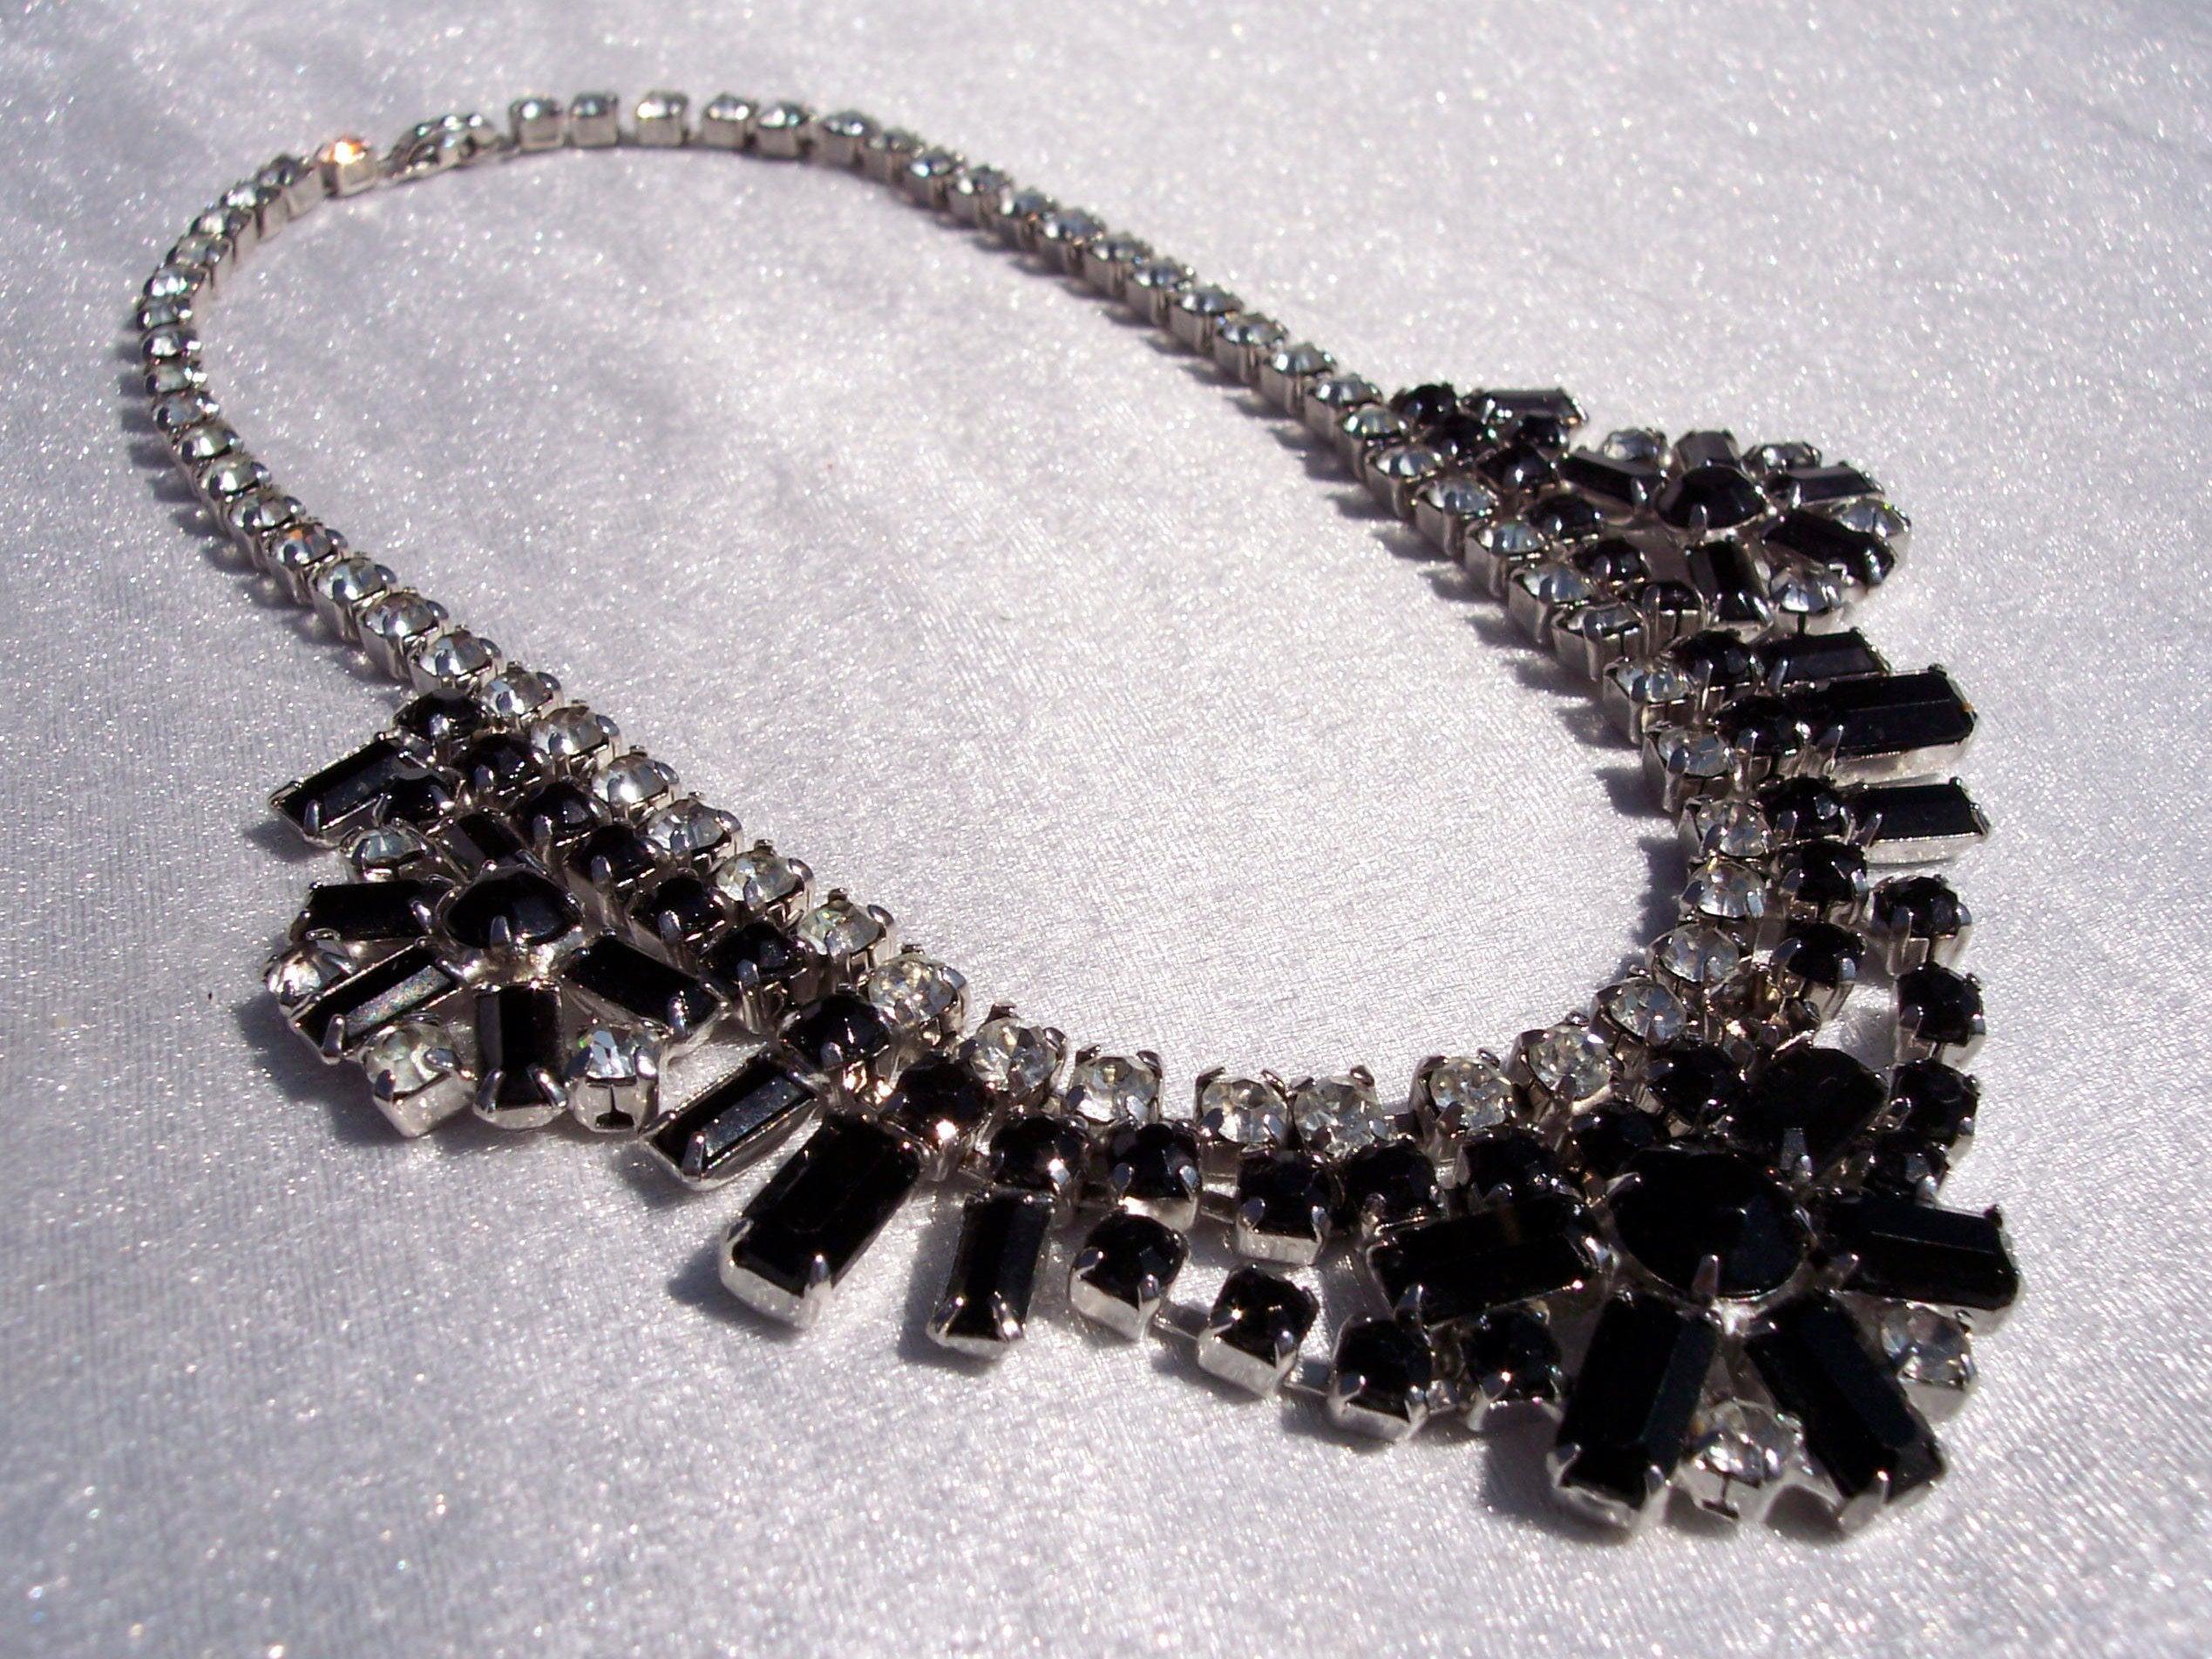 3de195aad Rhinestone Bib, Necklace, Warner, Designer, Black Clear Crystal, High End  Jewelry, Hallmarked, Vintage Fashion, Glamorous,